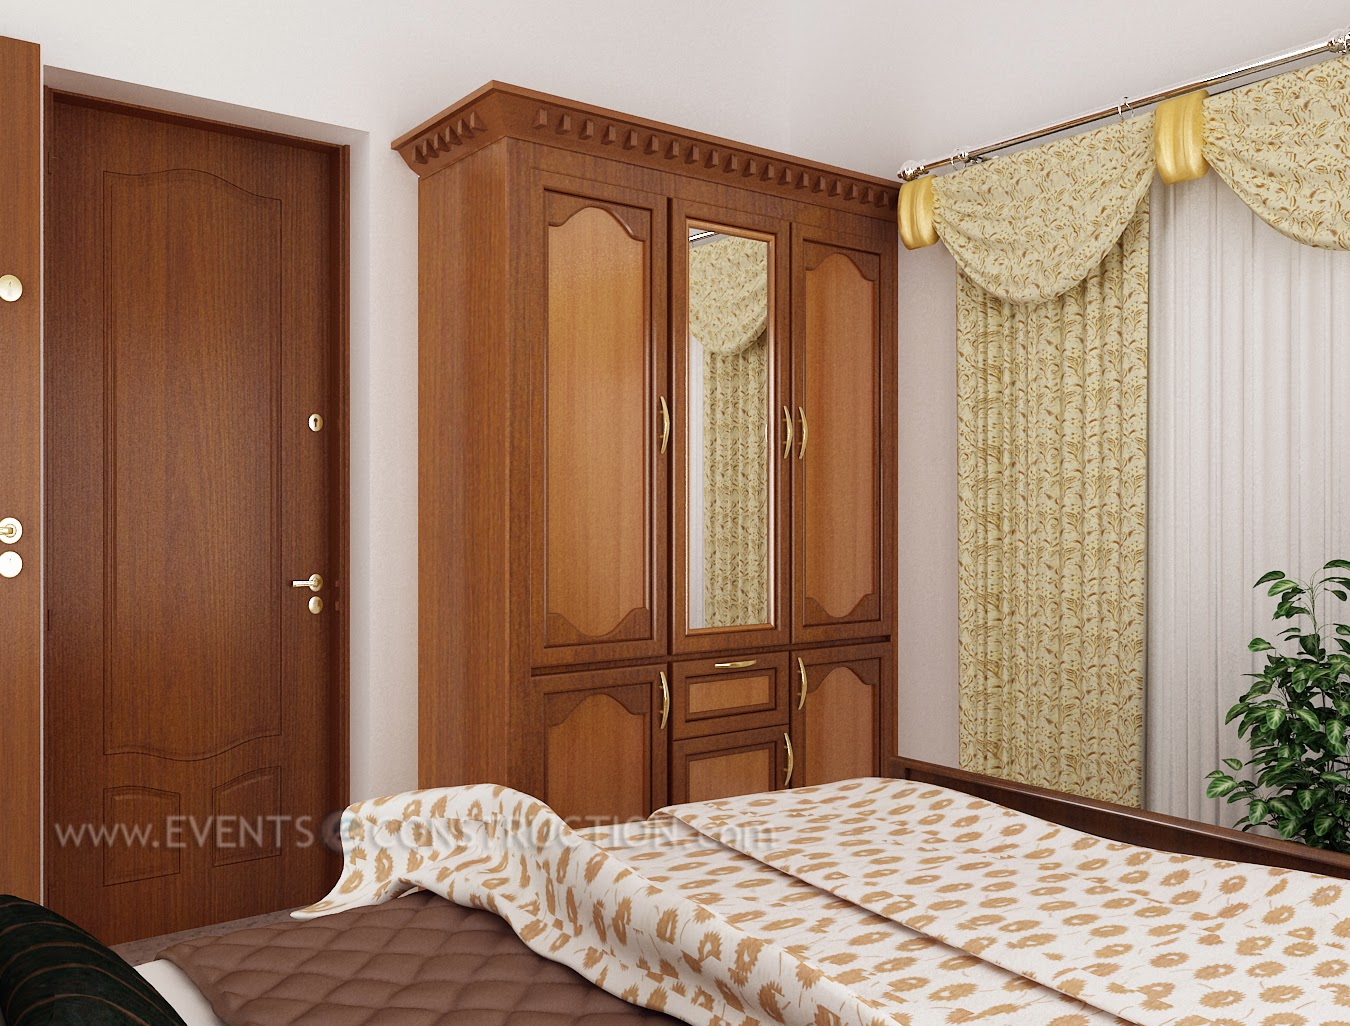 Evens Construction Pvt Ltd Bedroom Interior For Kerala Home